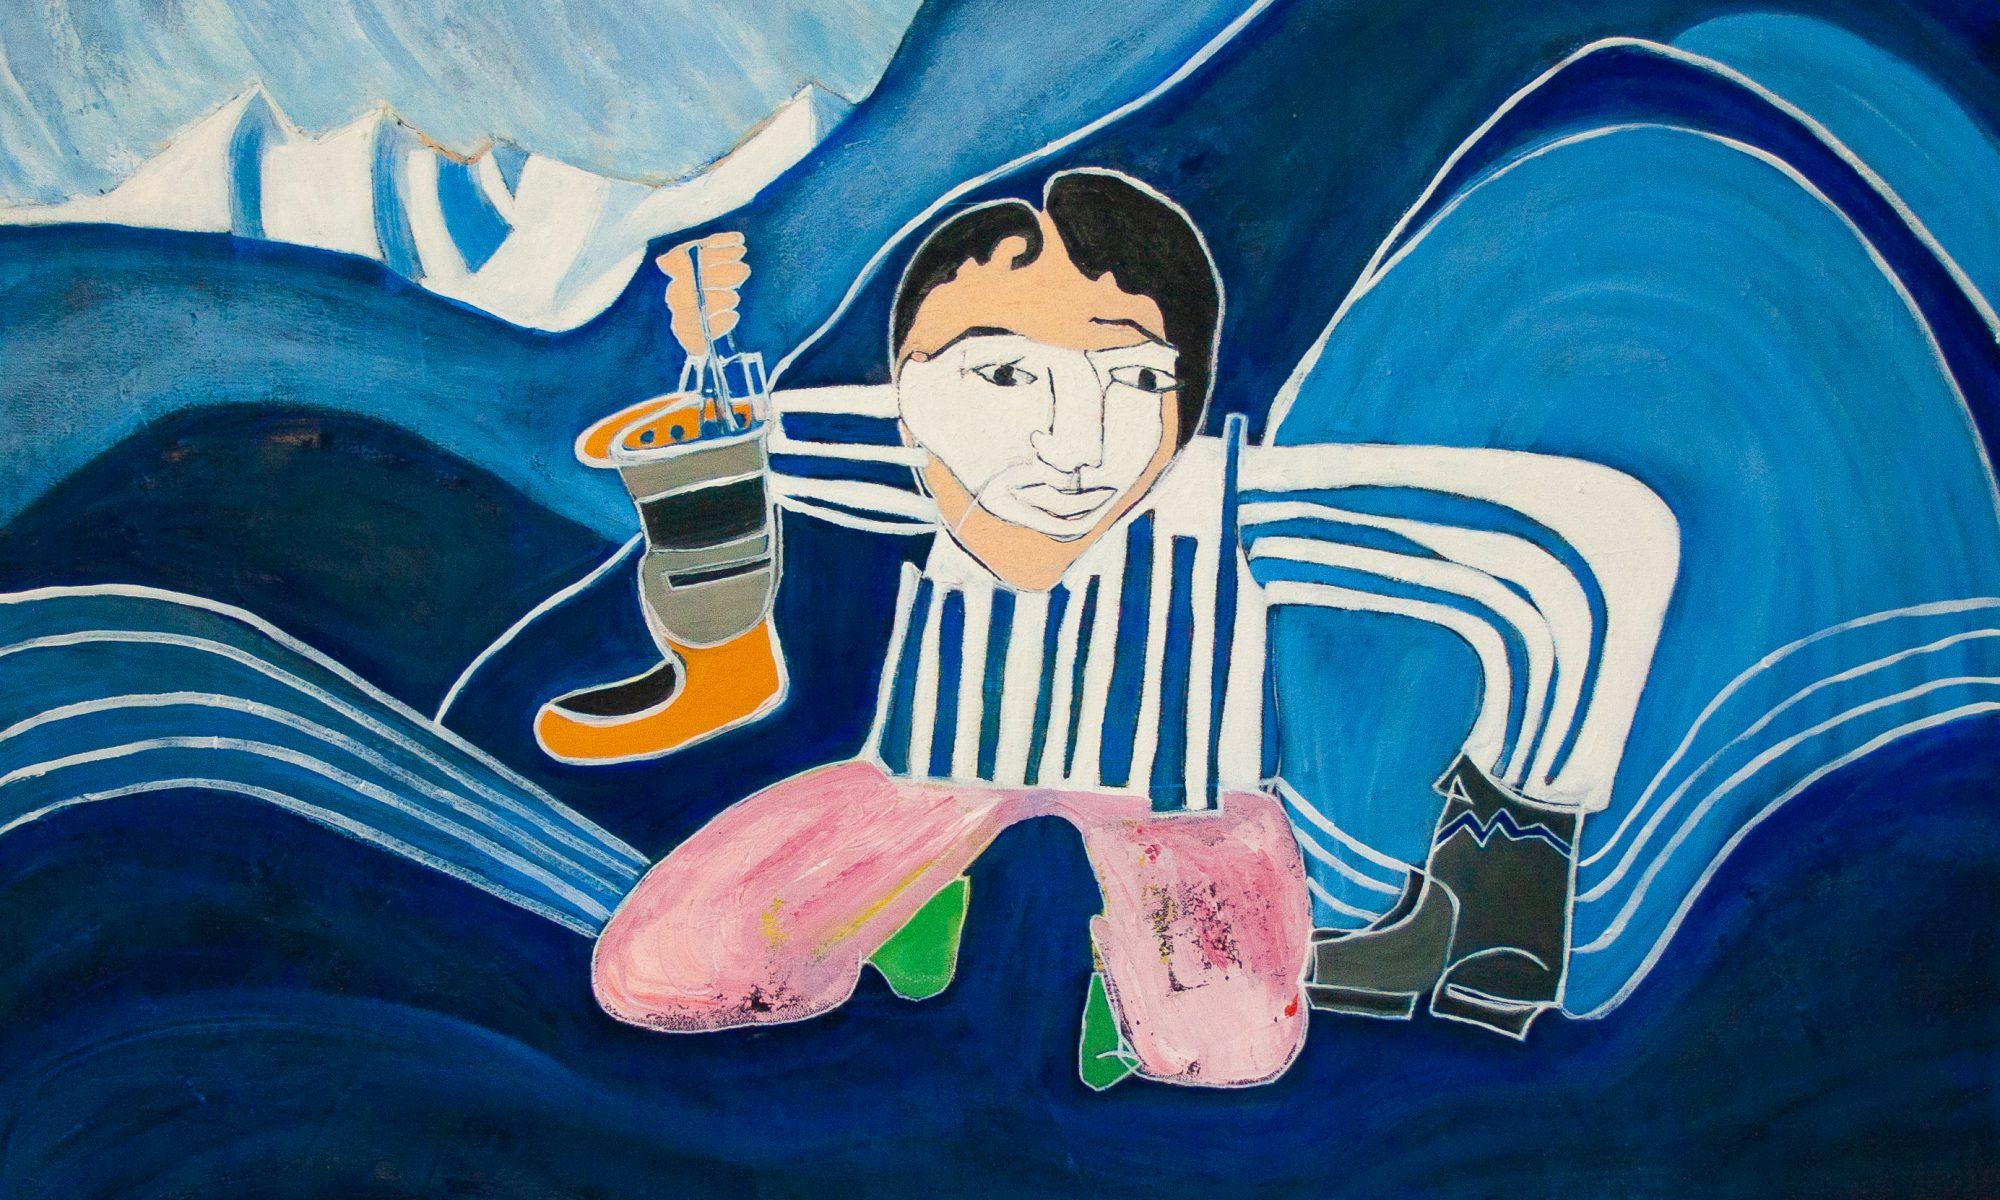 Blind Contour Homage: Pootoogook by Marlene Lowden